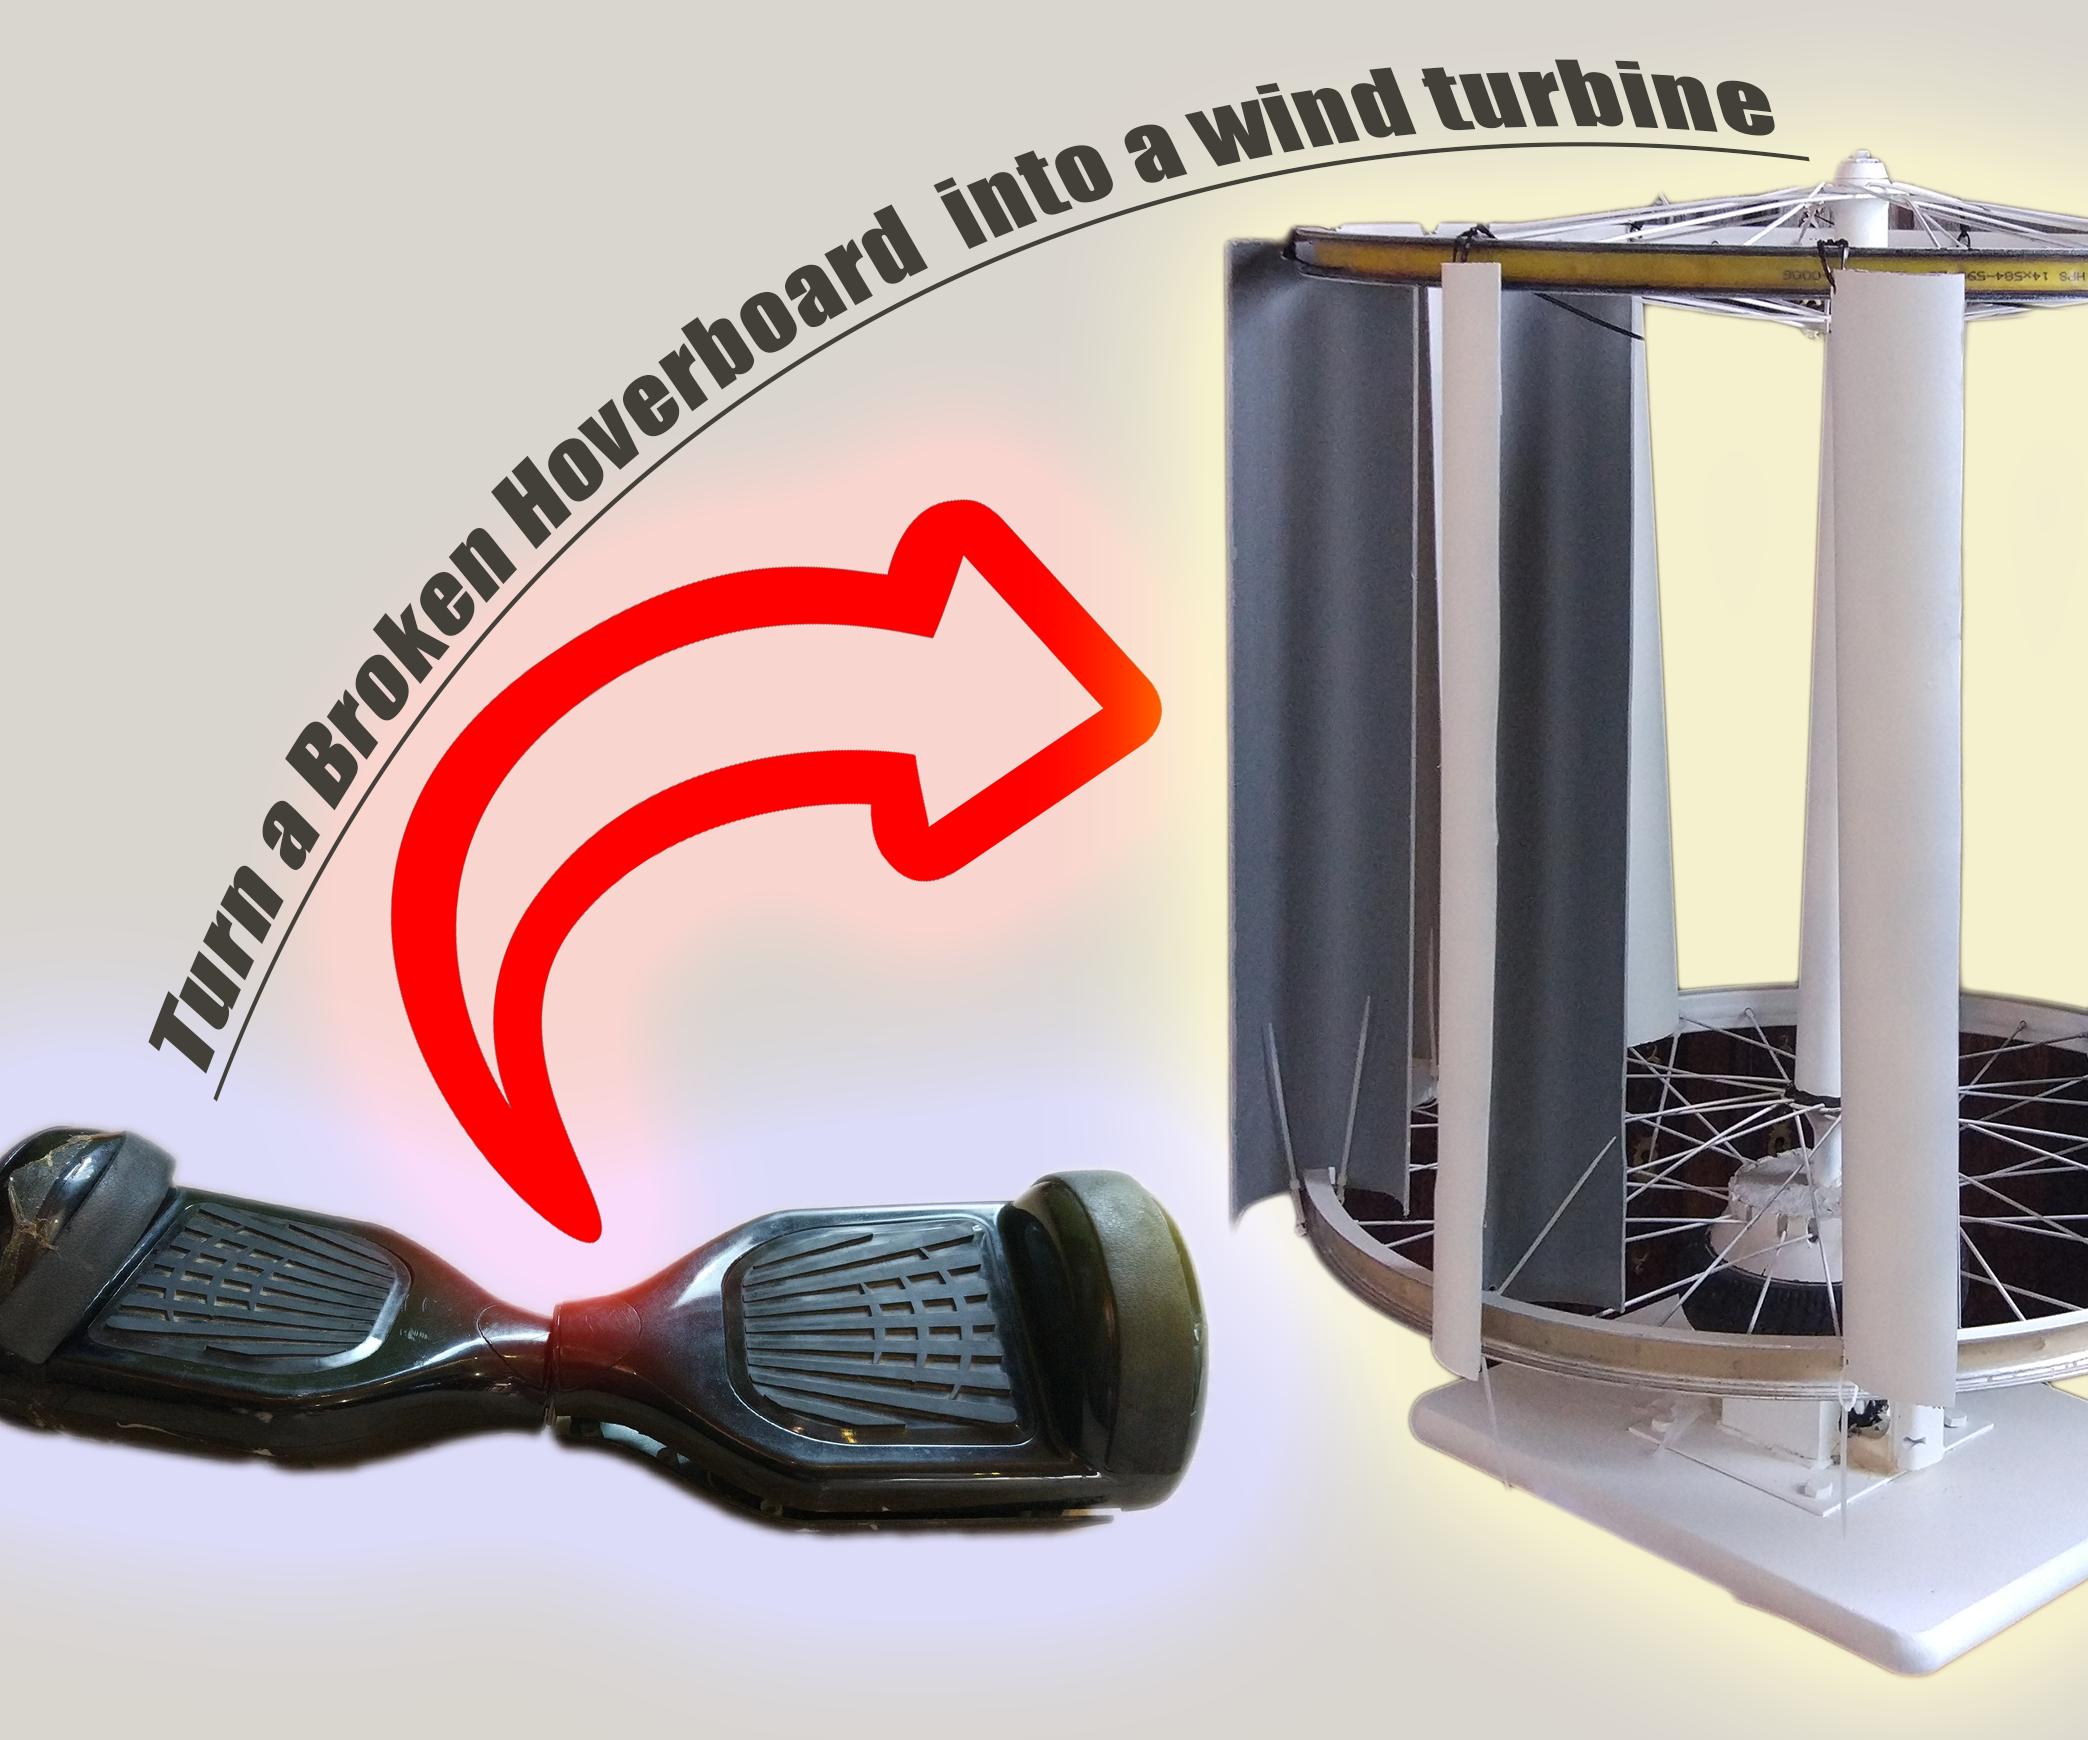 Turn a Broken Hoverboard Into a Vertical Wind Turbine EN/FR Transformer Un Hoverboard Cassé En Une Éolienne Verticale